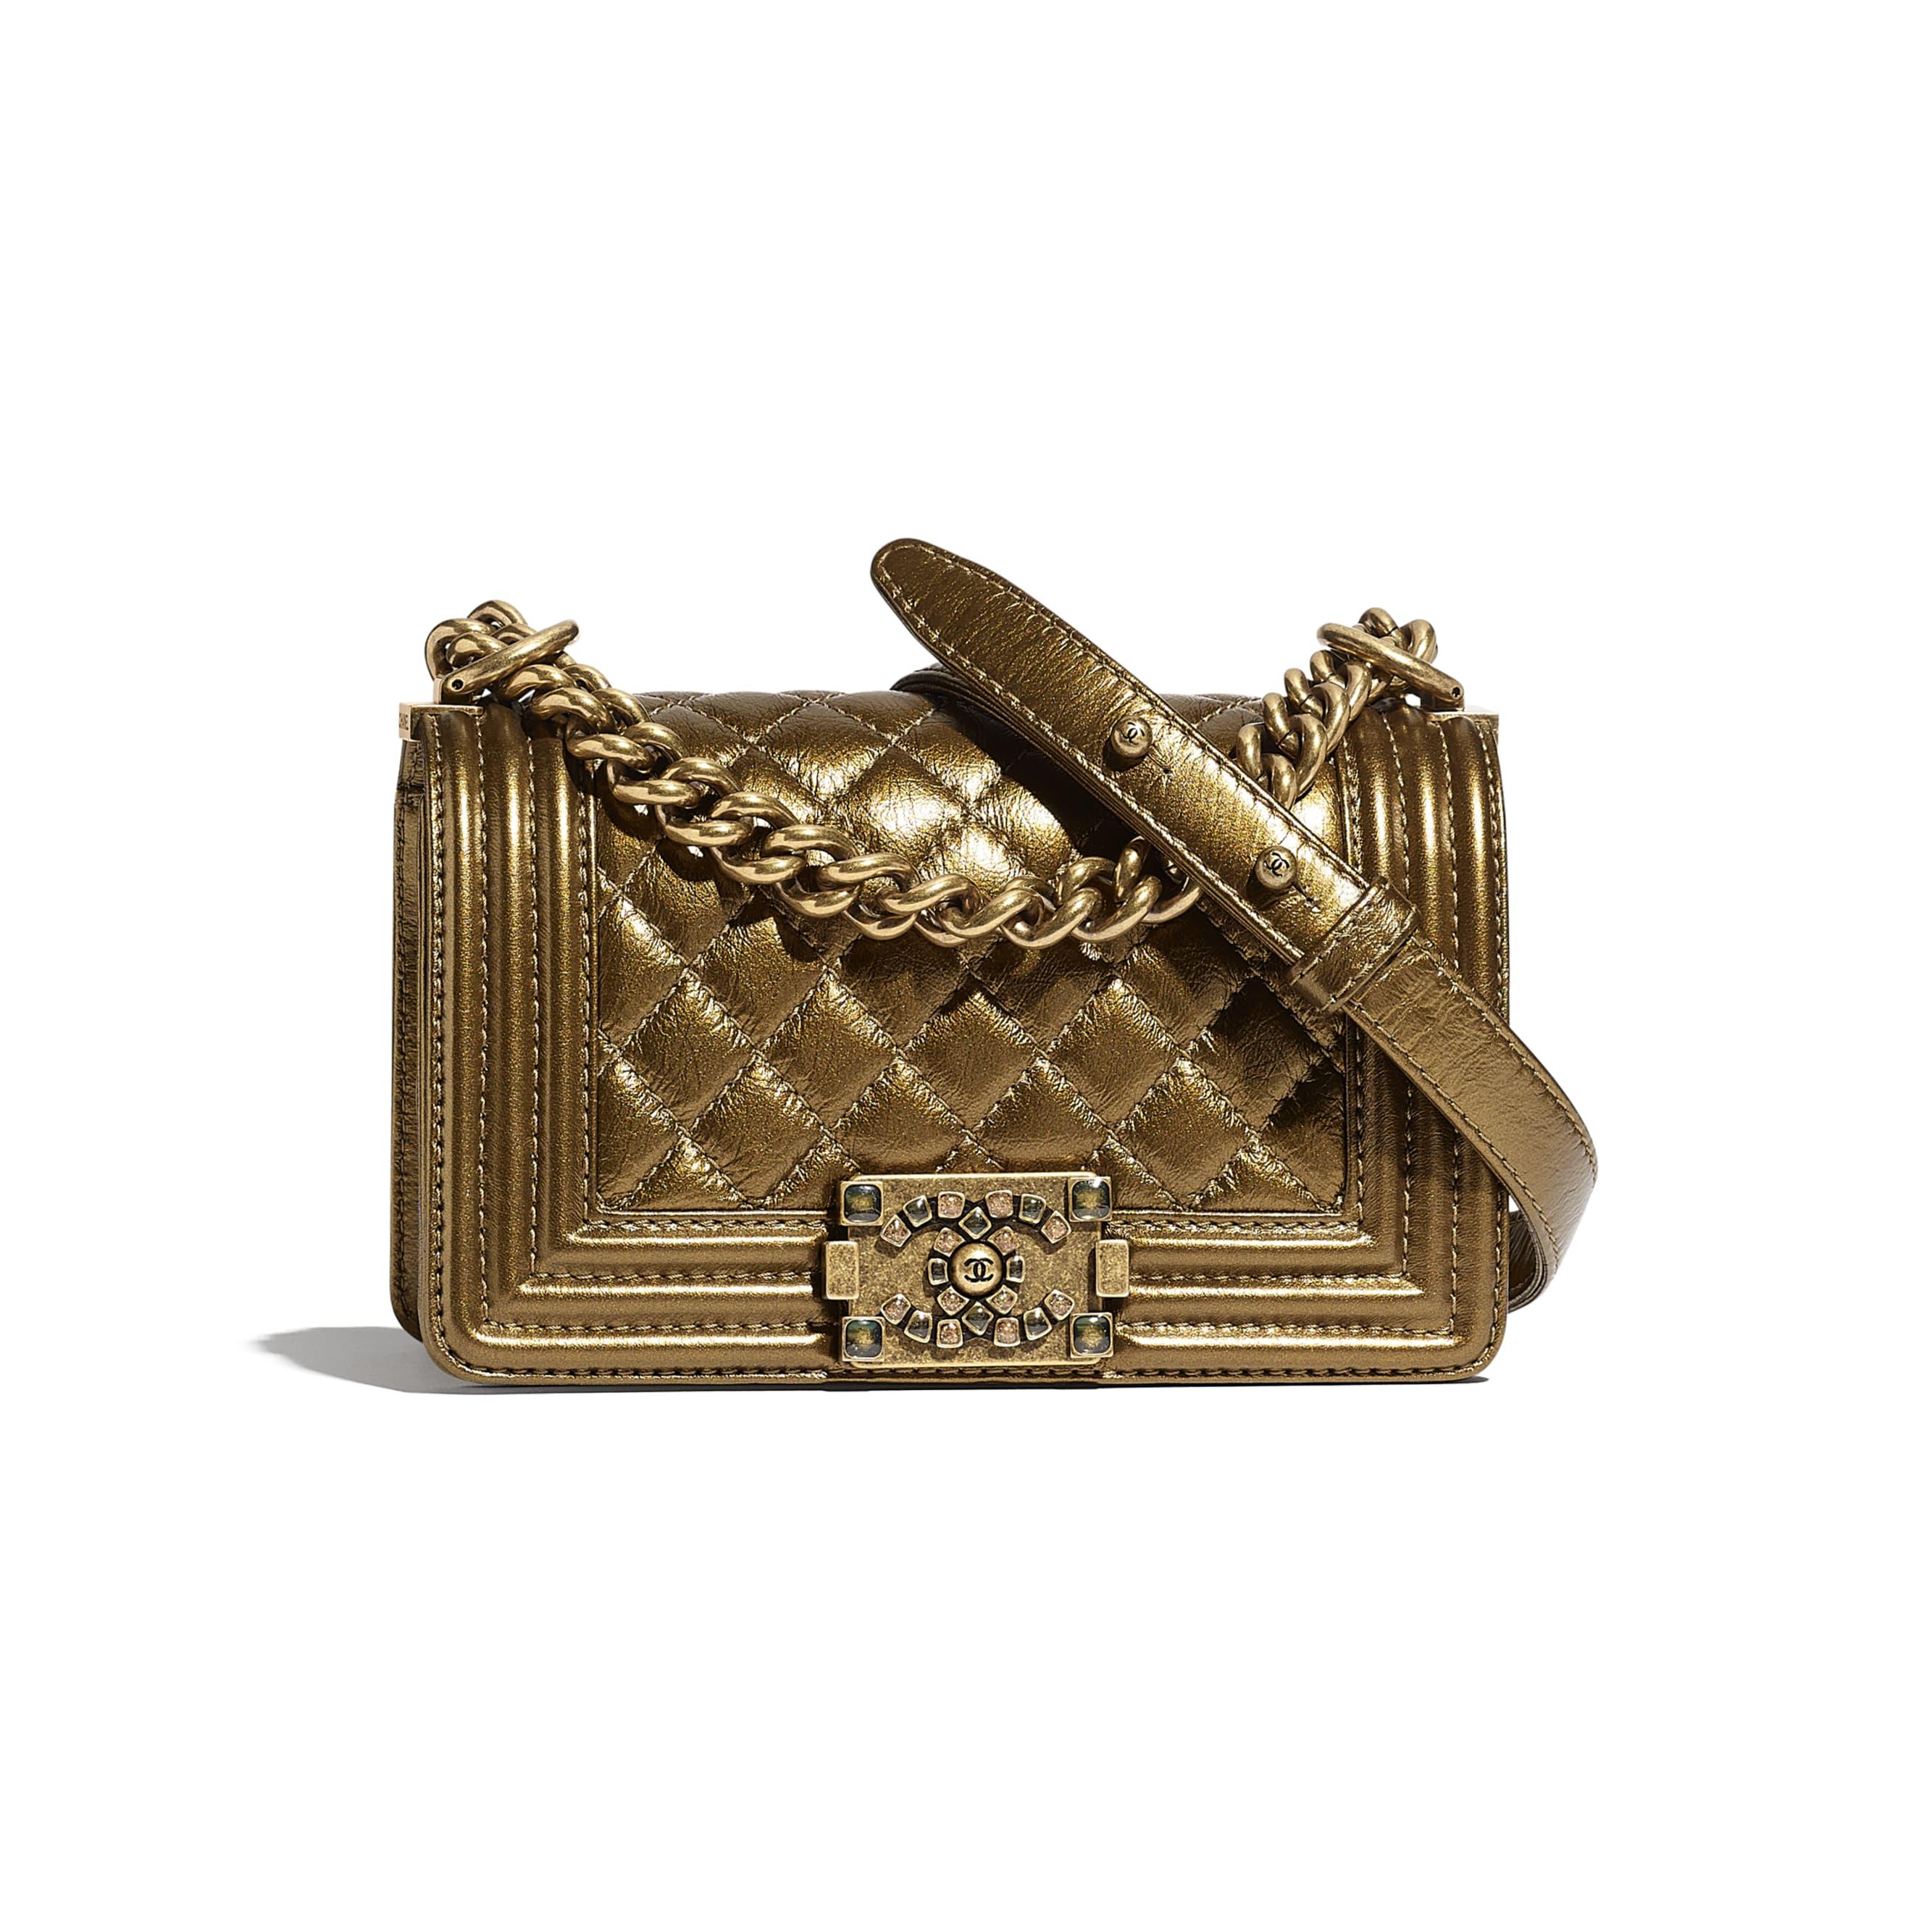 Small BOY CHANEL Handbag - Gold - Metallic Calfskin, Enamel & Gold-Tone Metal - CHANEL - Default view - see standard sized version